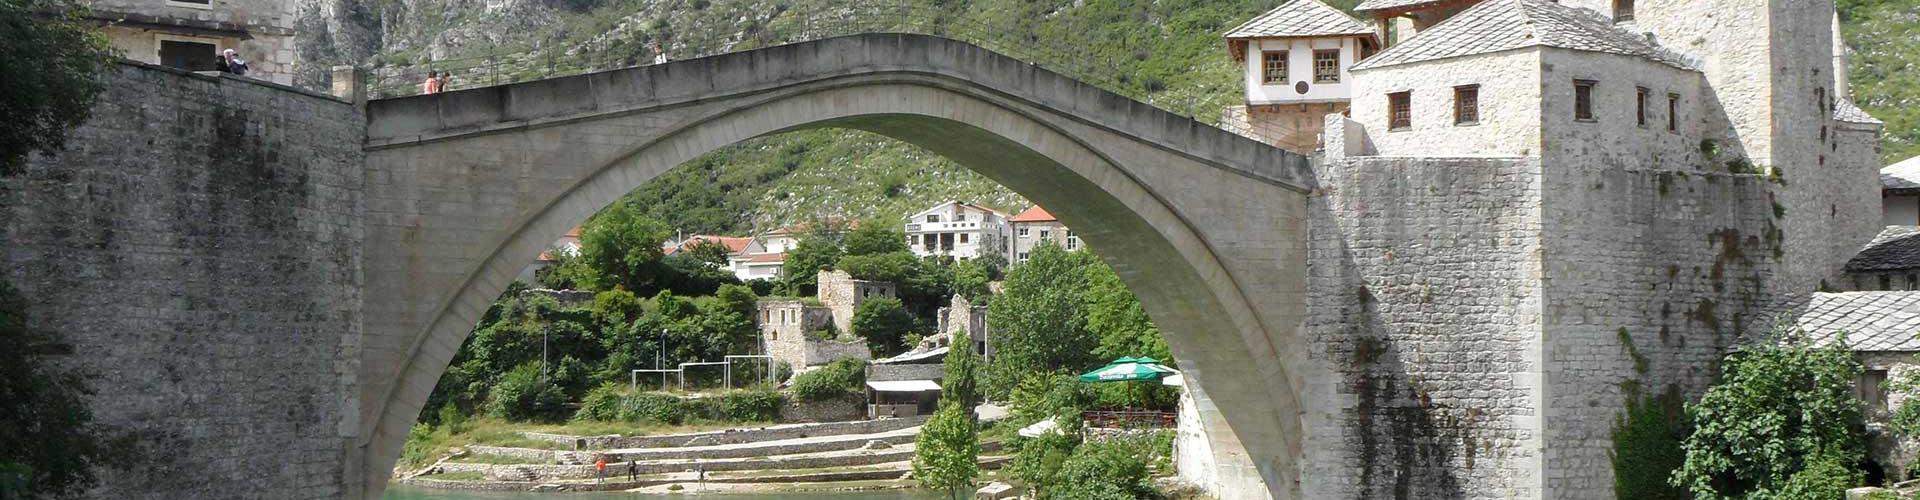 Stari Most bridge  in Mostar, Bosnia and Herzegovina (Credit: Courtesy of Terri Cook and Lon Abbott)